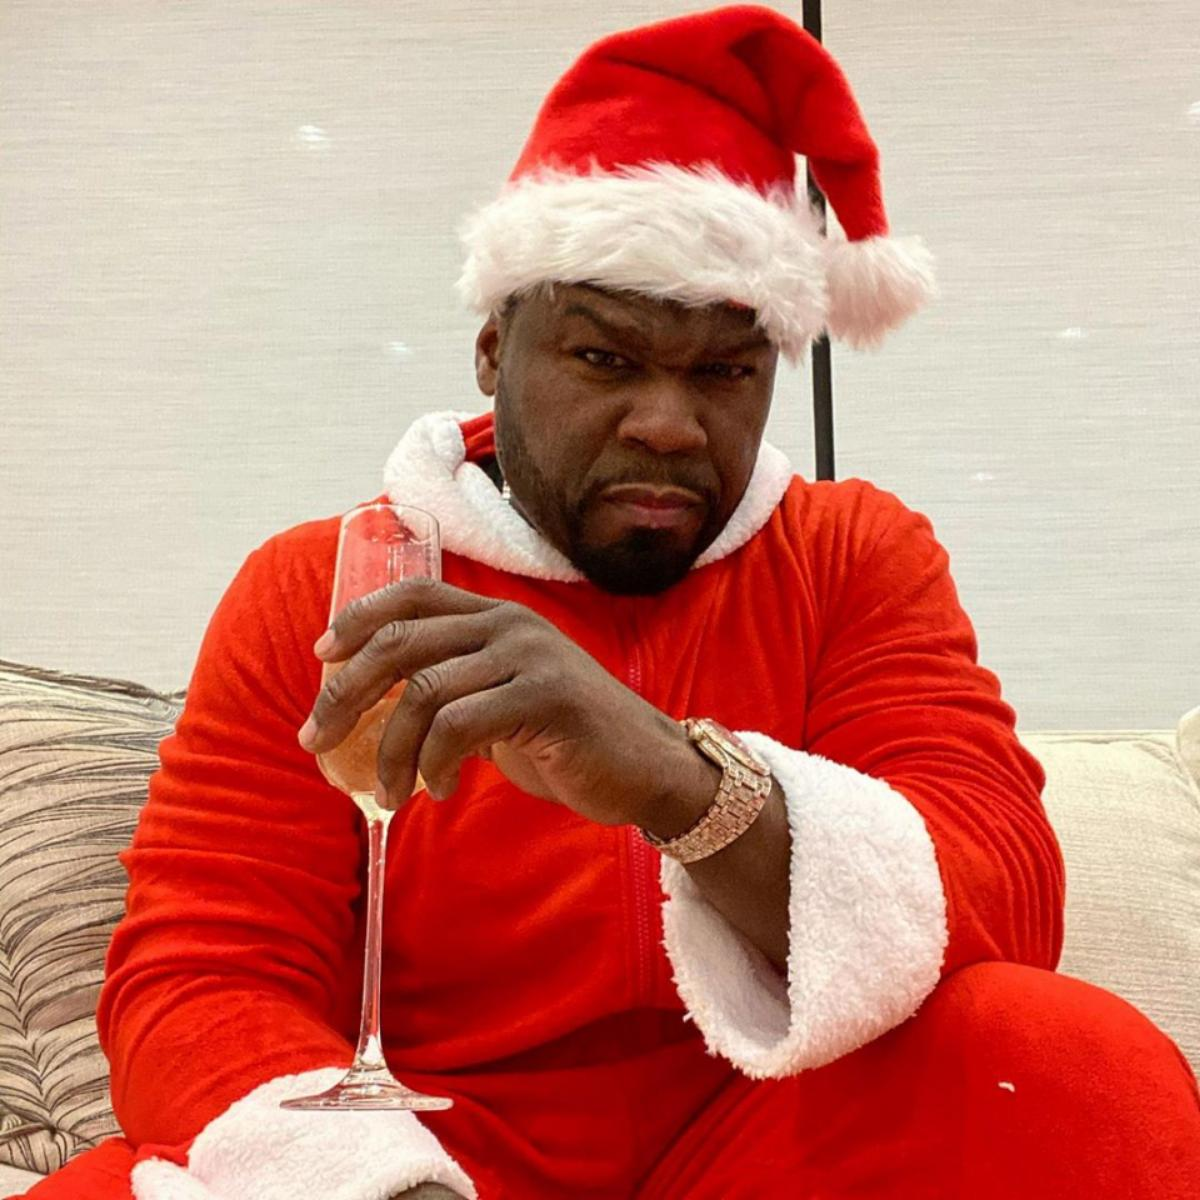 50 Cent Santa Claus Outfit